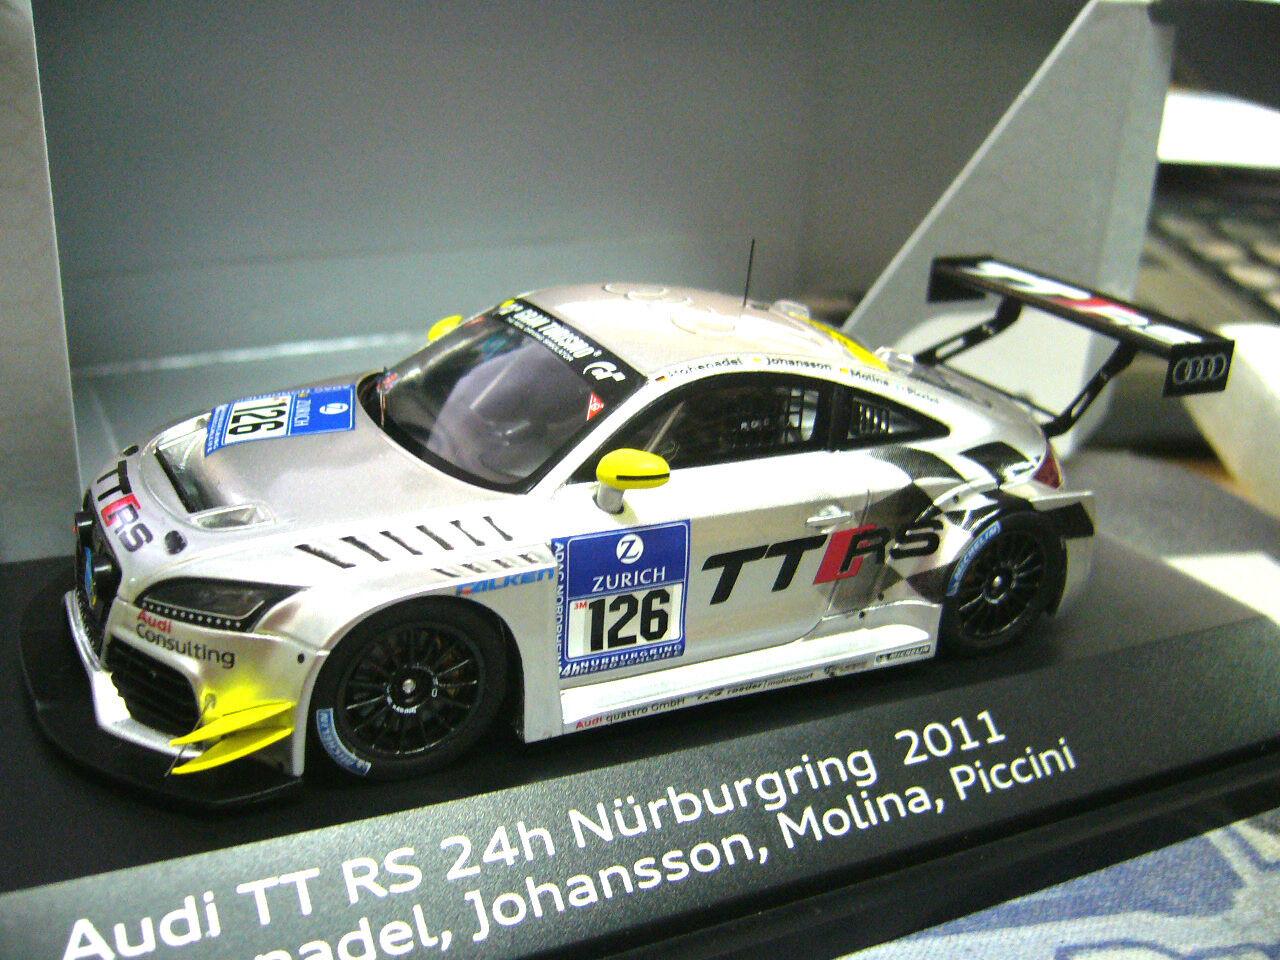 AUDI TT RS 24 H Nurburgring 2011  126 Johansson Molina hohenade Resin Spark 1 43